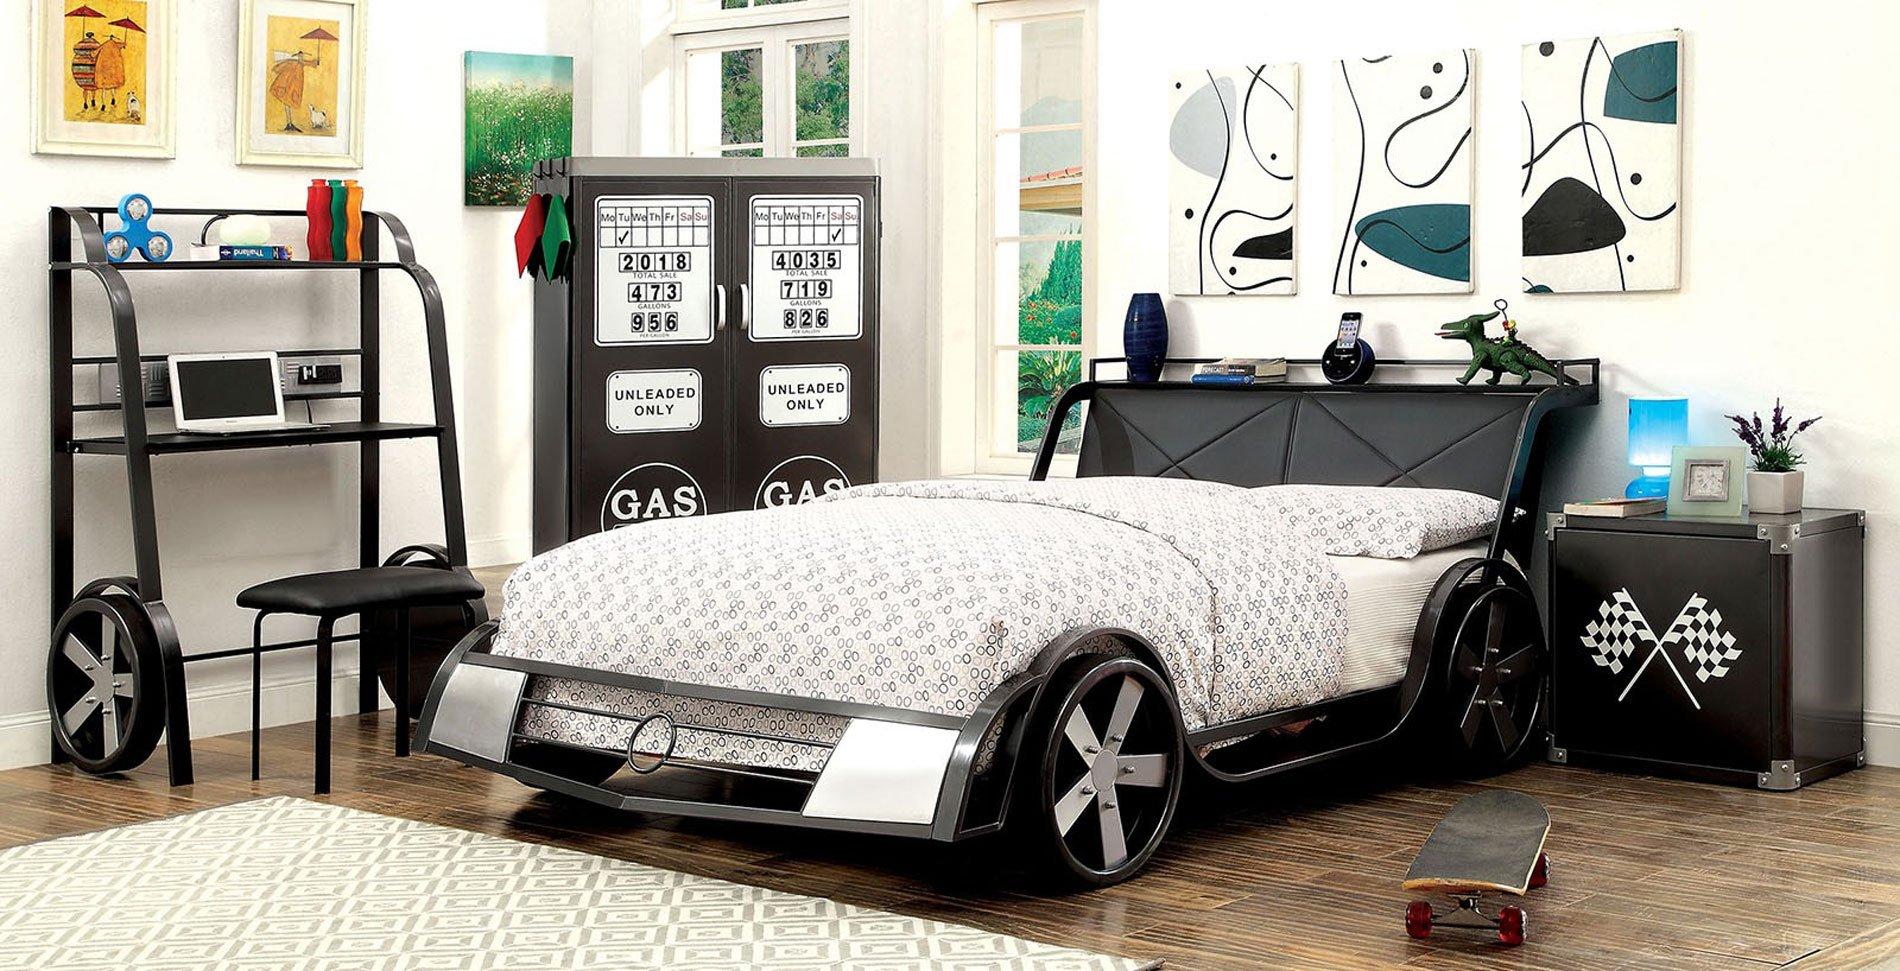 Gt Racer Youth Bedroom Set